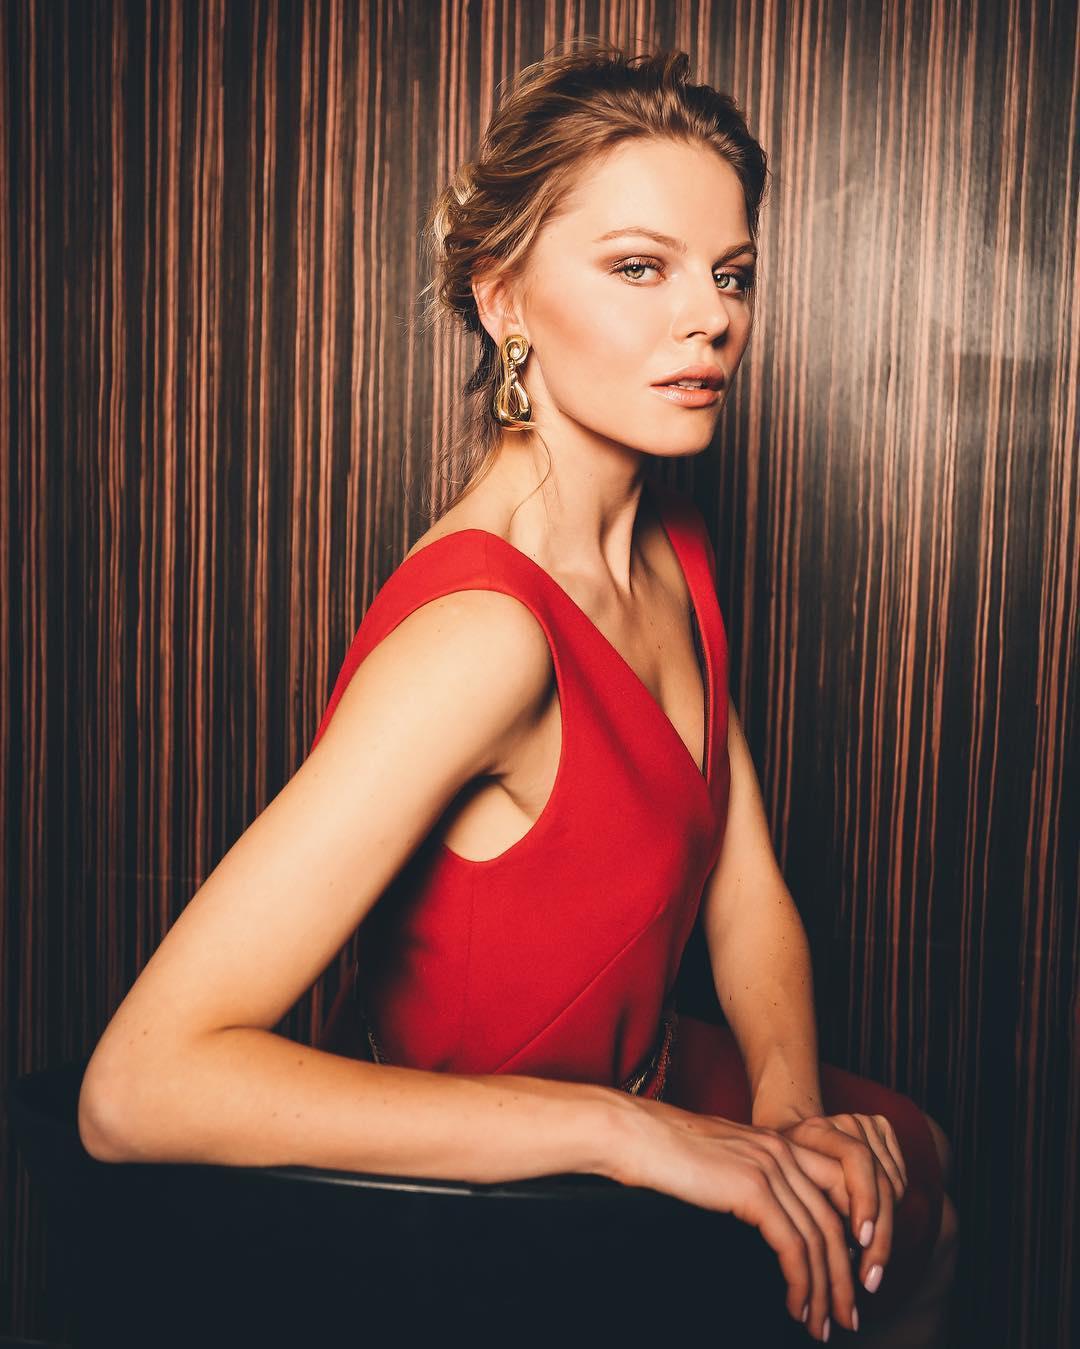 Анастасия Стежко: I got my red dress on tonightDancin' in the dark in the pale moonlightDone my hair up real big, beauty queen styleHigh heels off, I'm feelin' alive